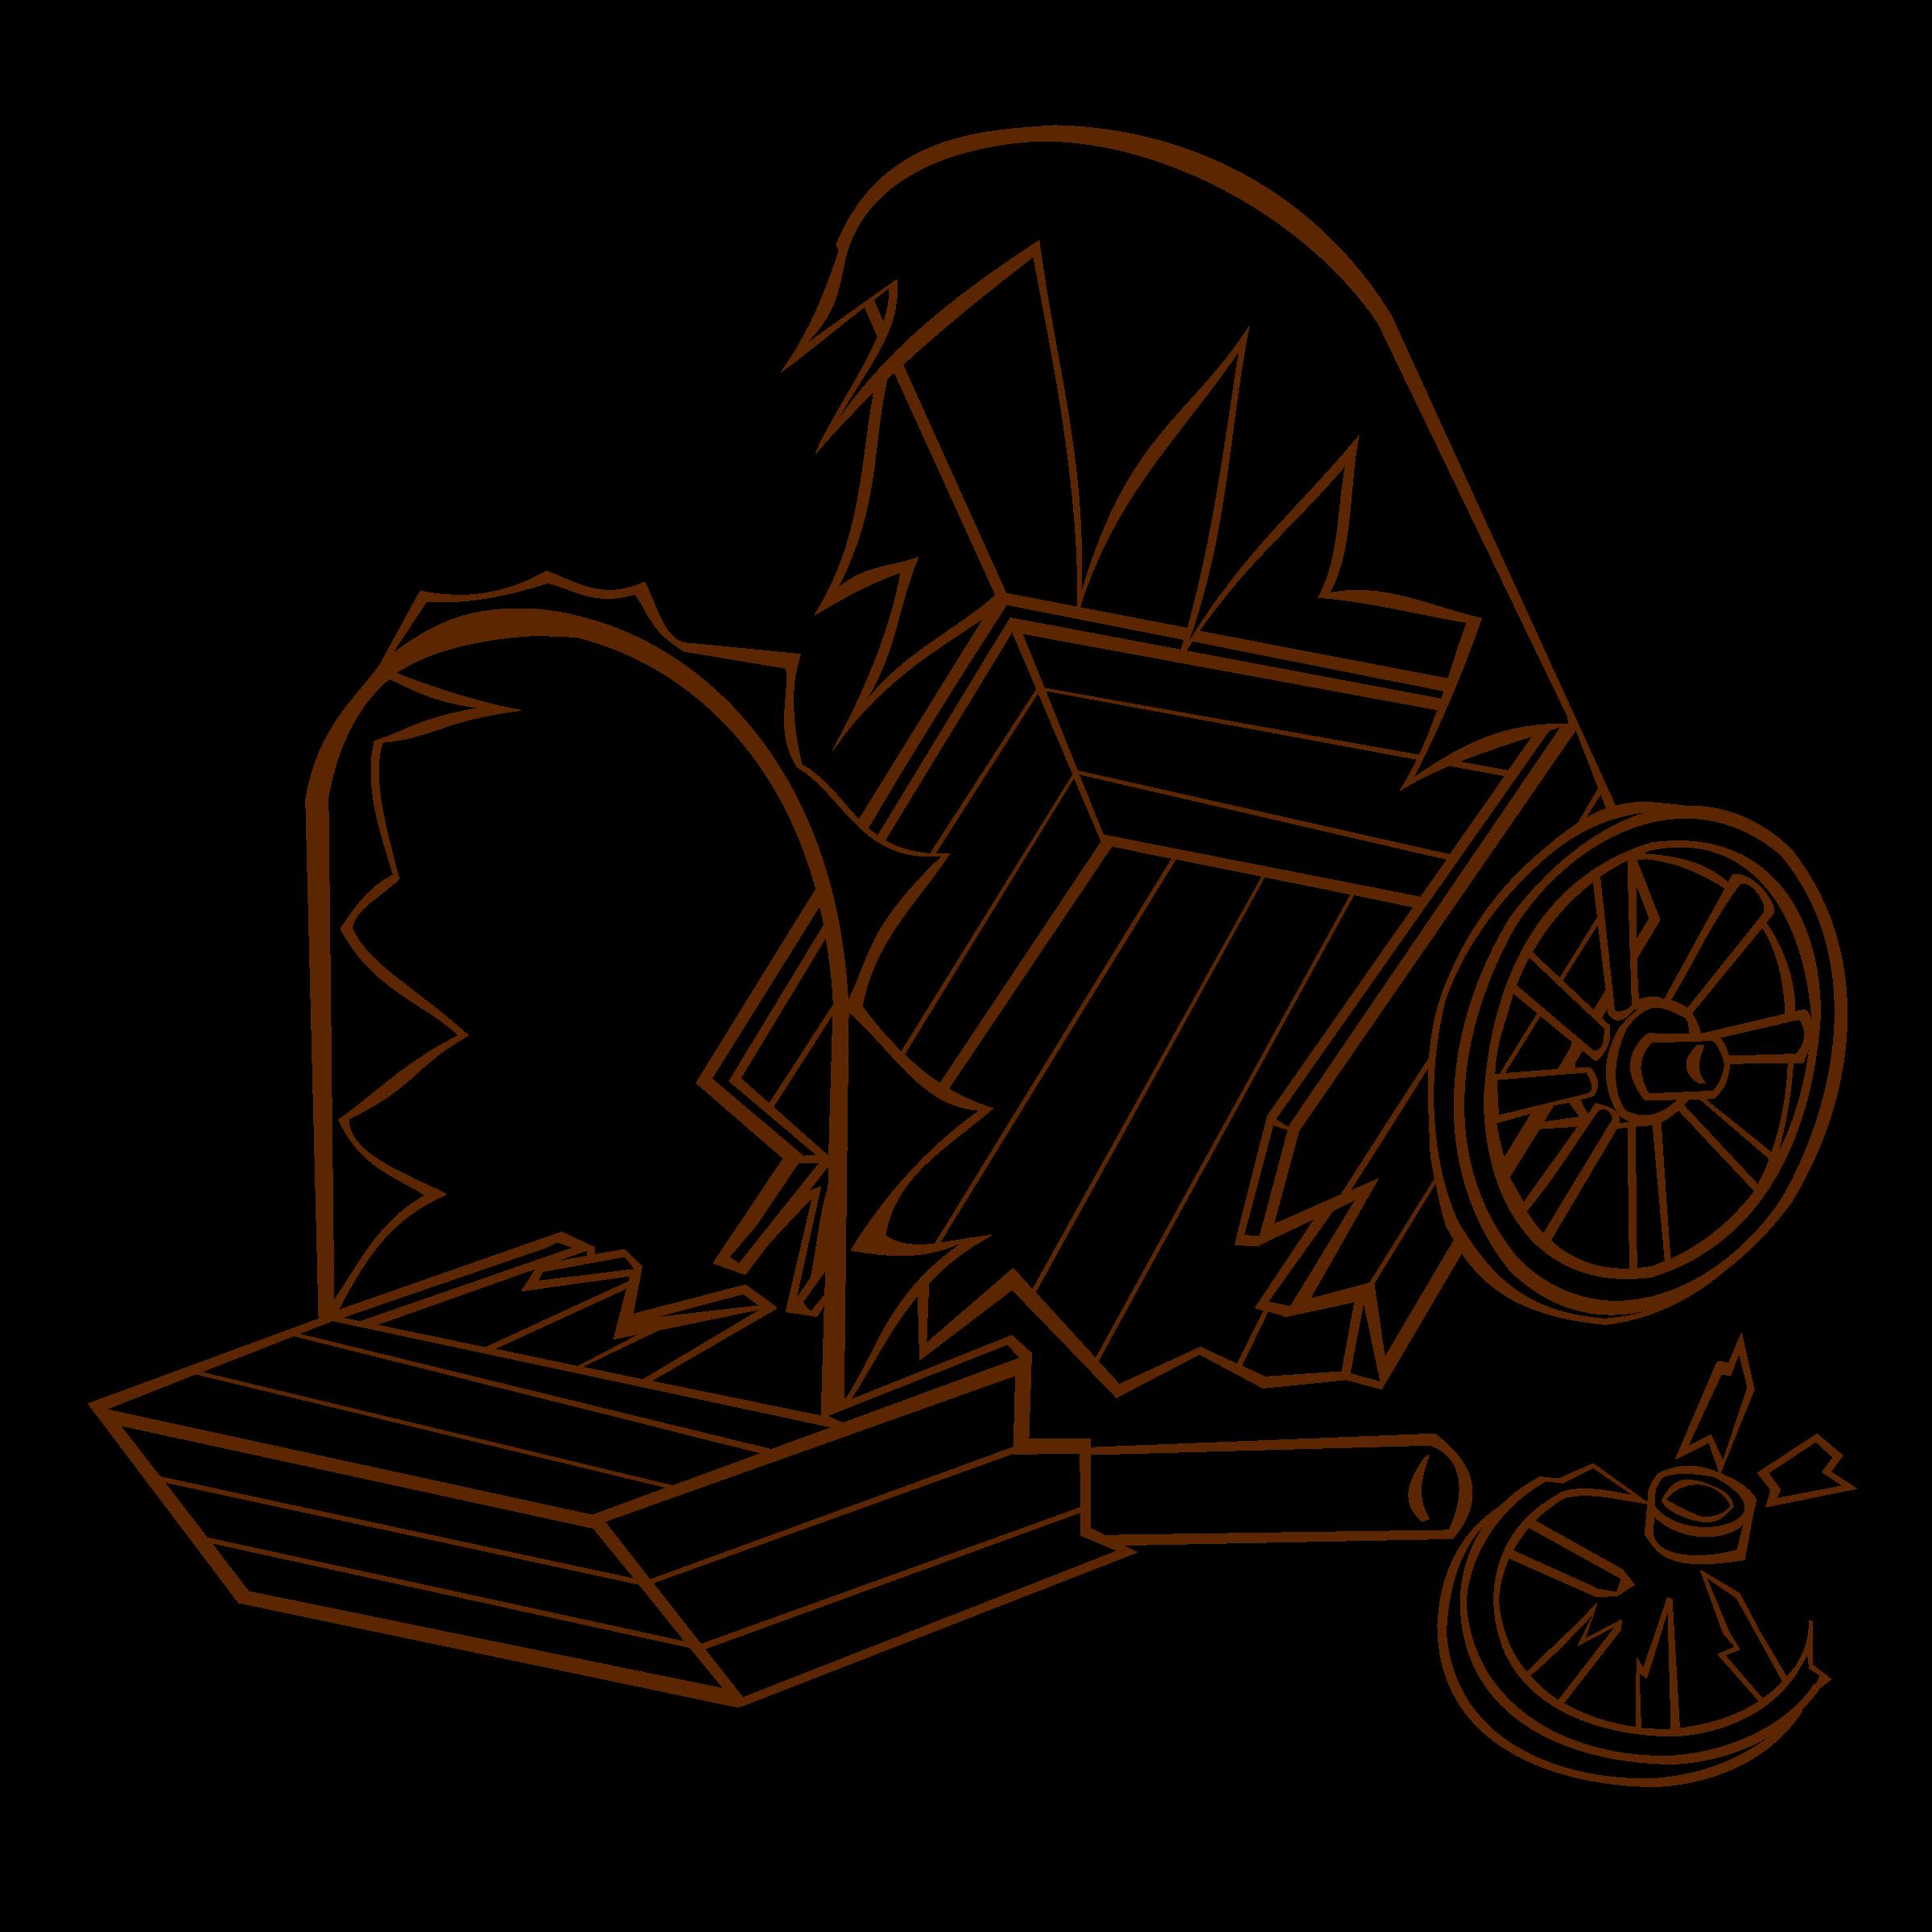 Wagon clipart drawing. Rpg map symbols caravan